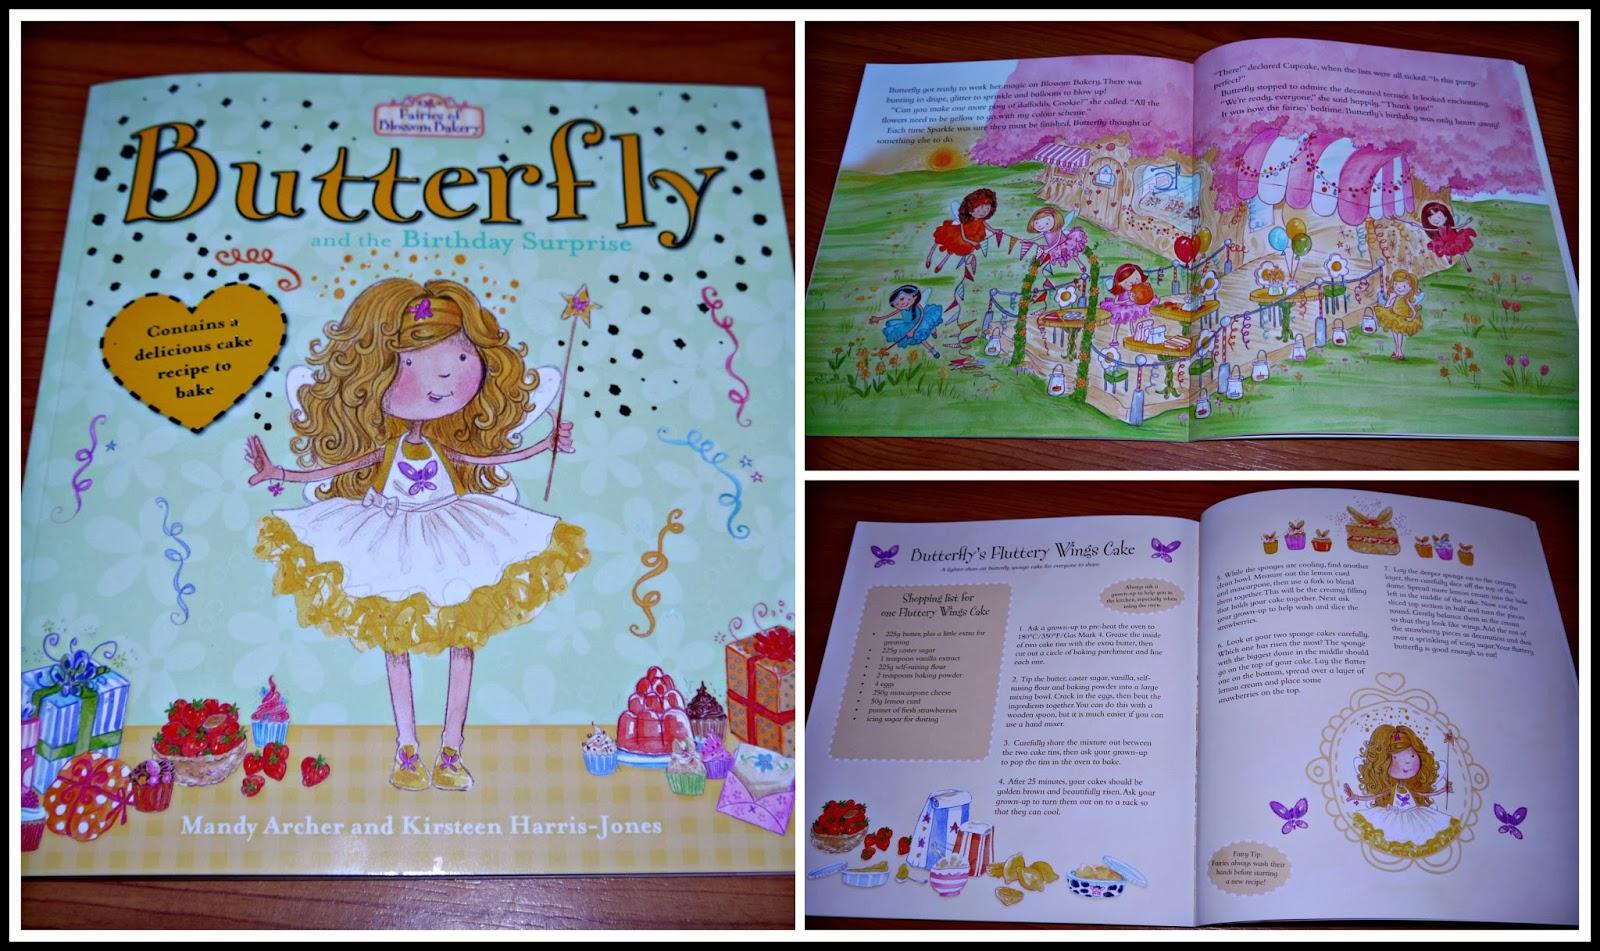 fairy, picture book, random house